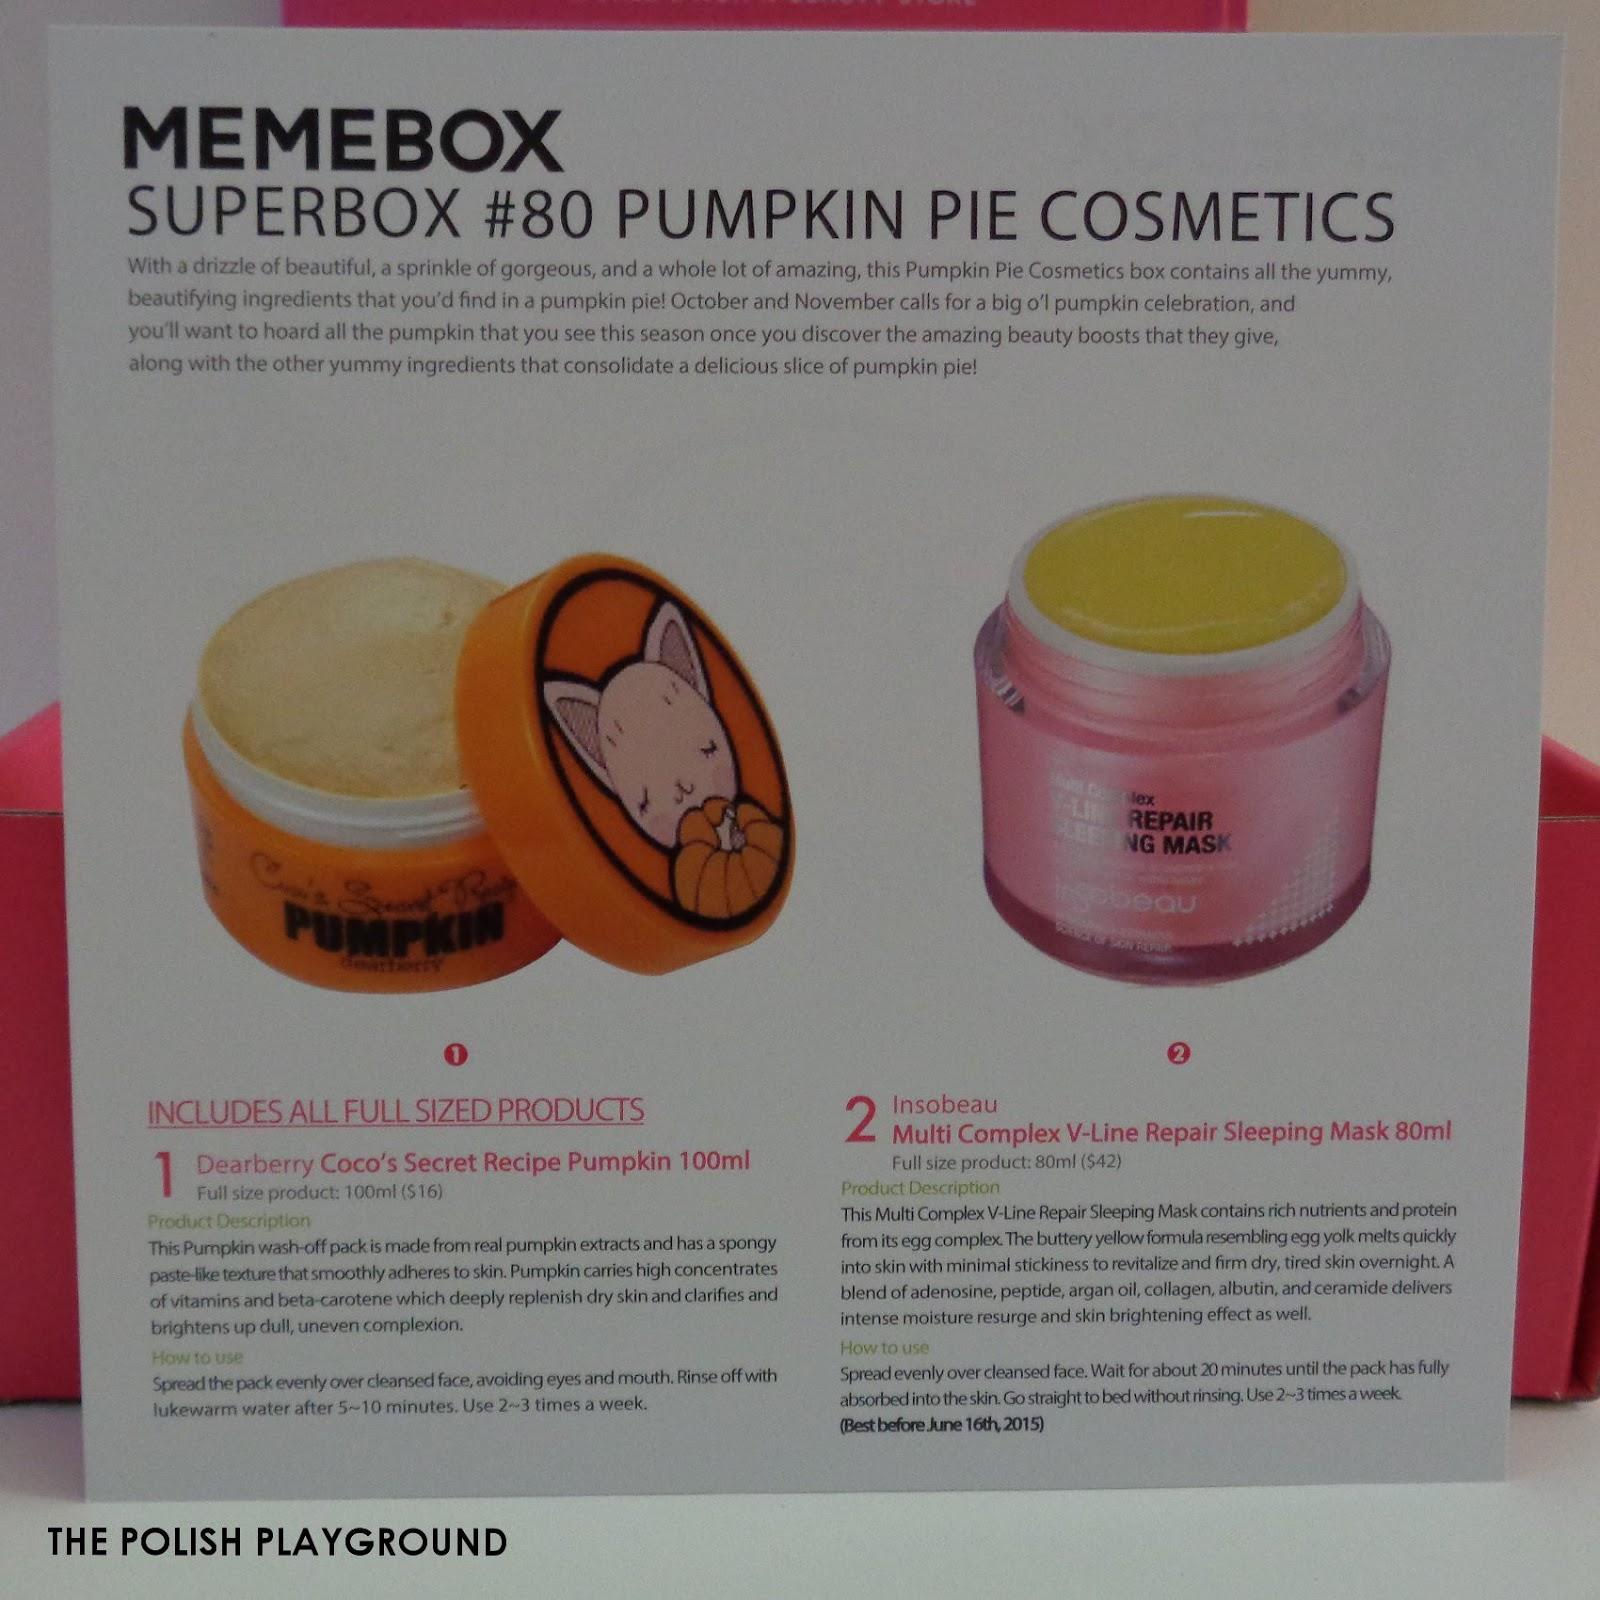 Memebox Superbox #80 Pumpkin Pie Cosmetics Unboxing